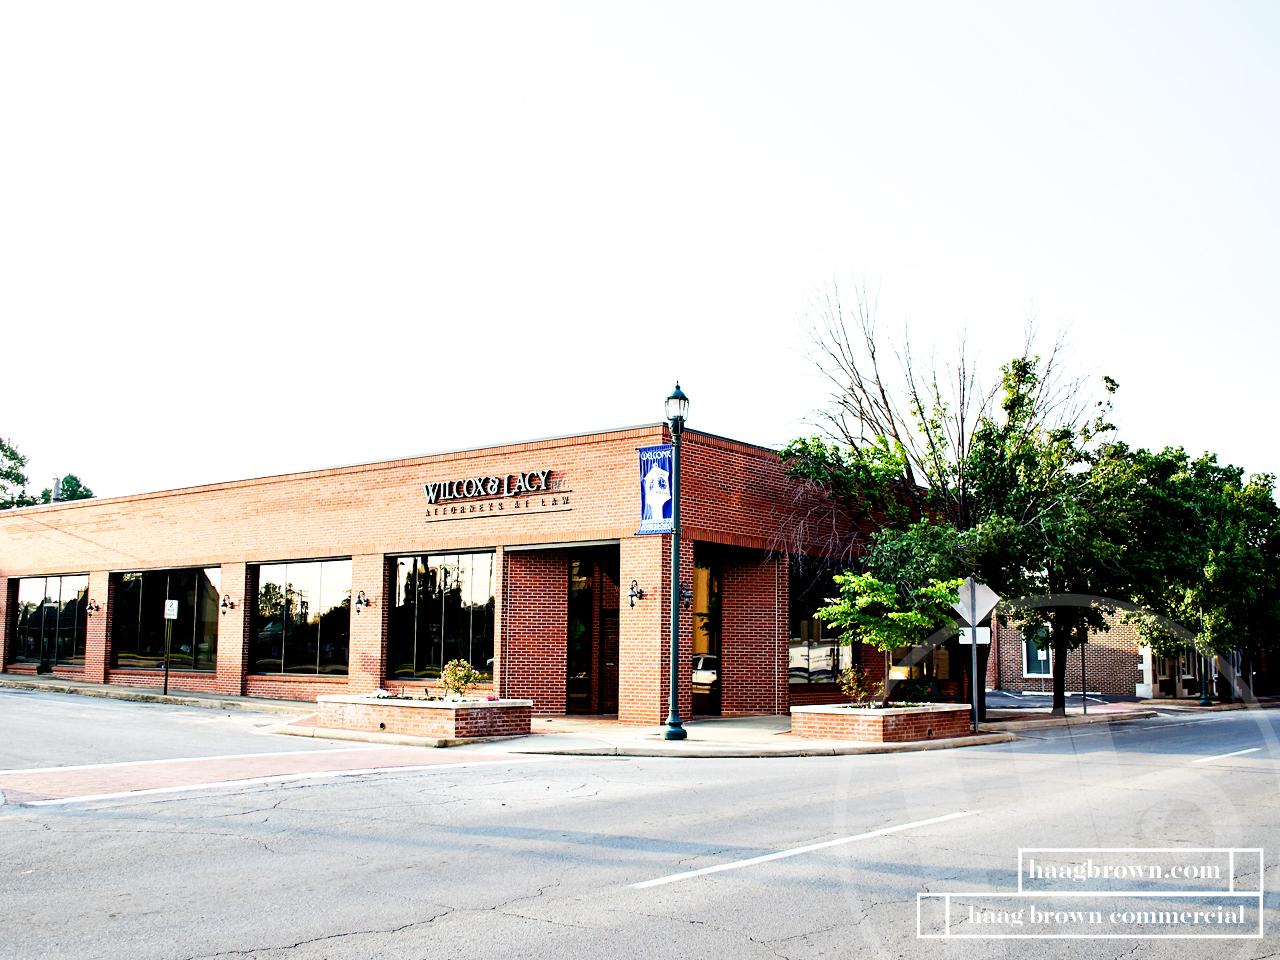 600 S. Main in Jonesboro, AR